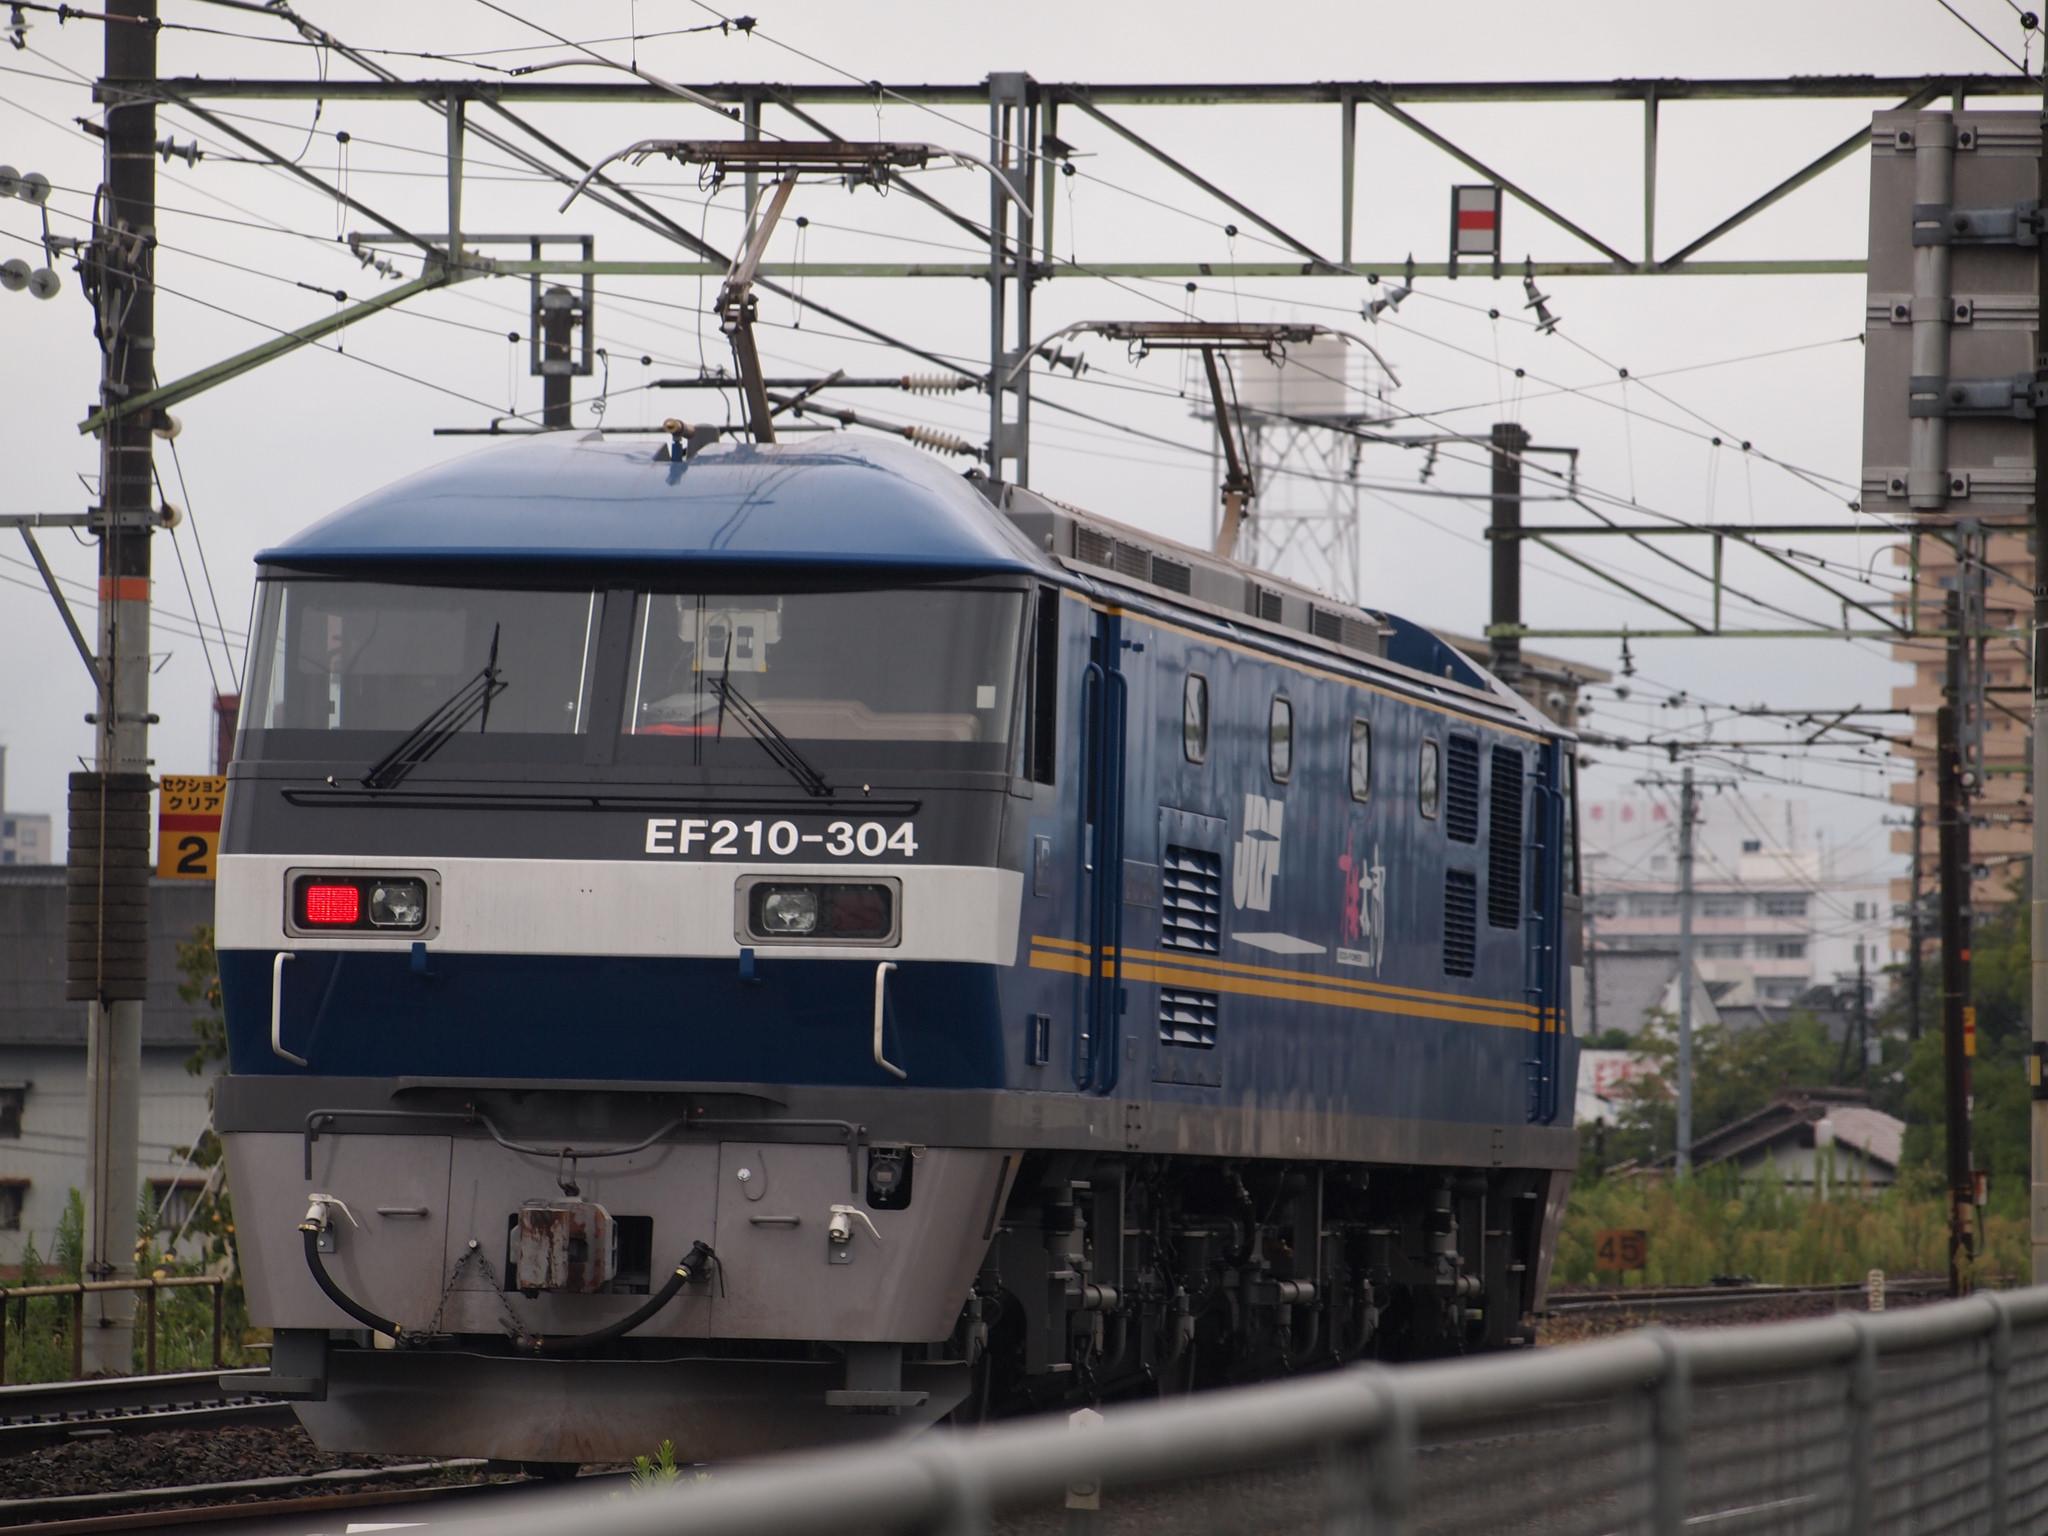 EF210-304